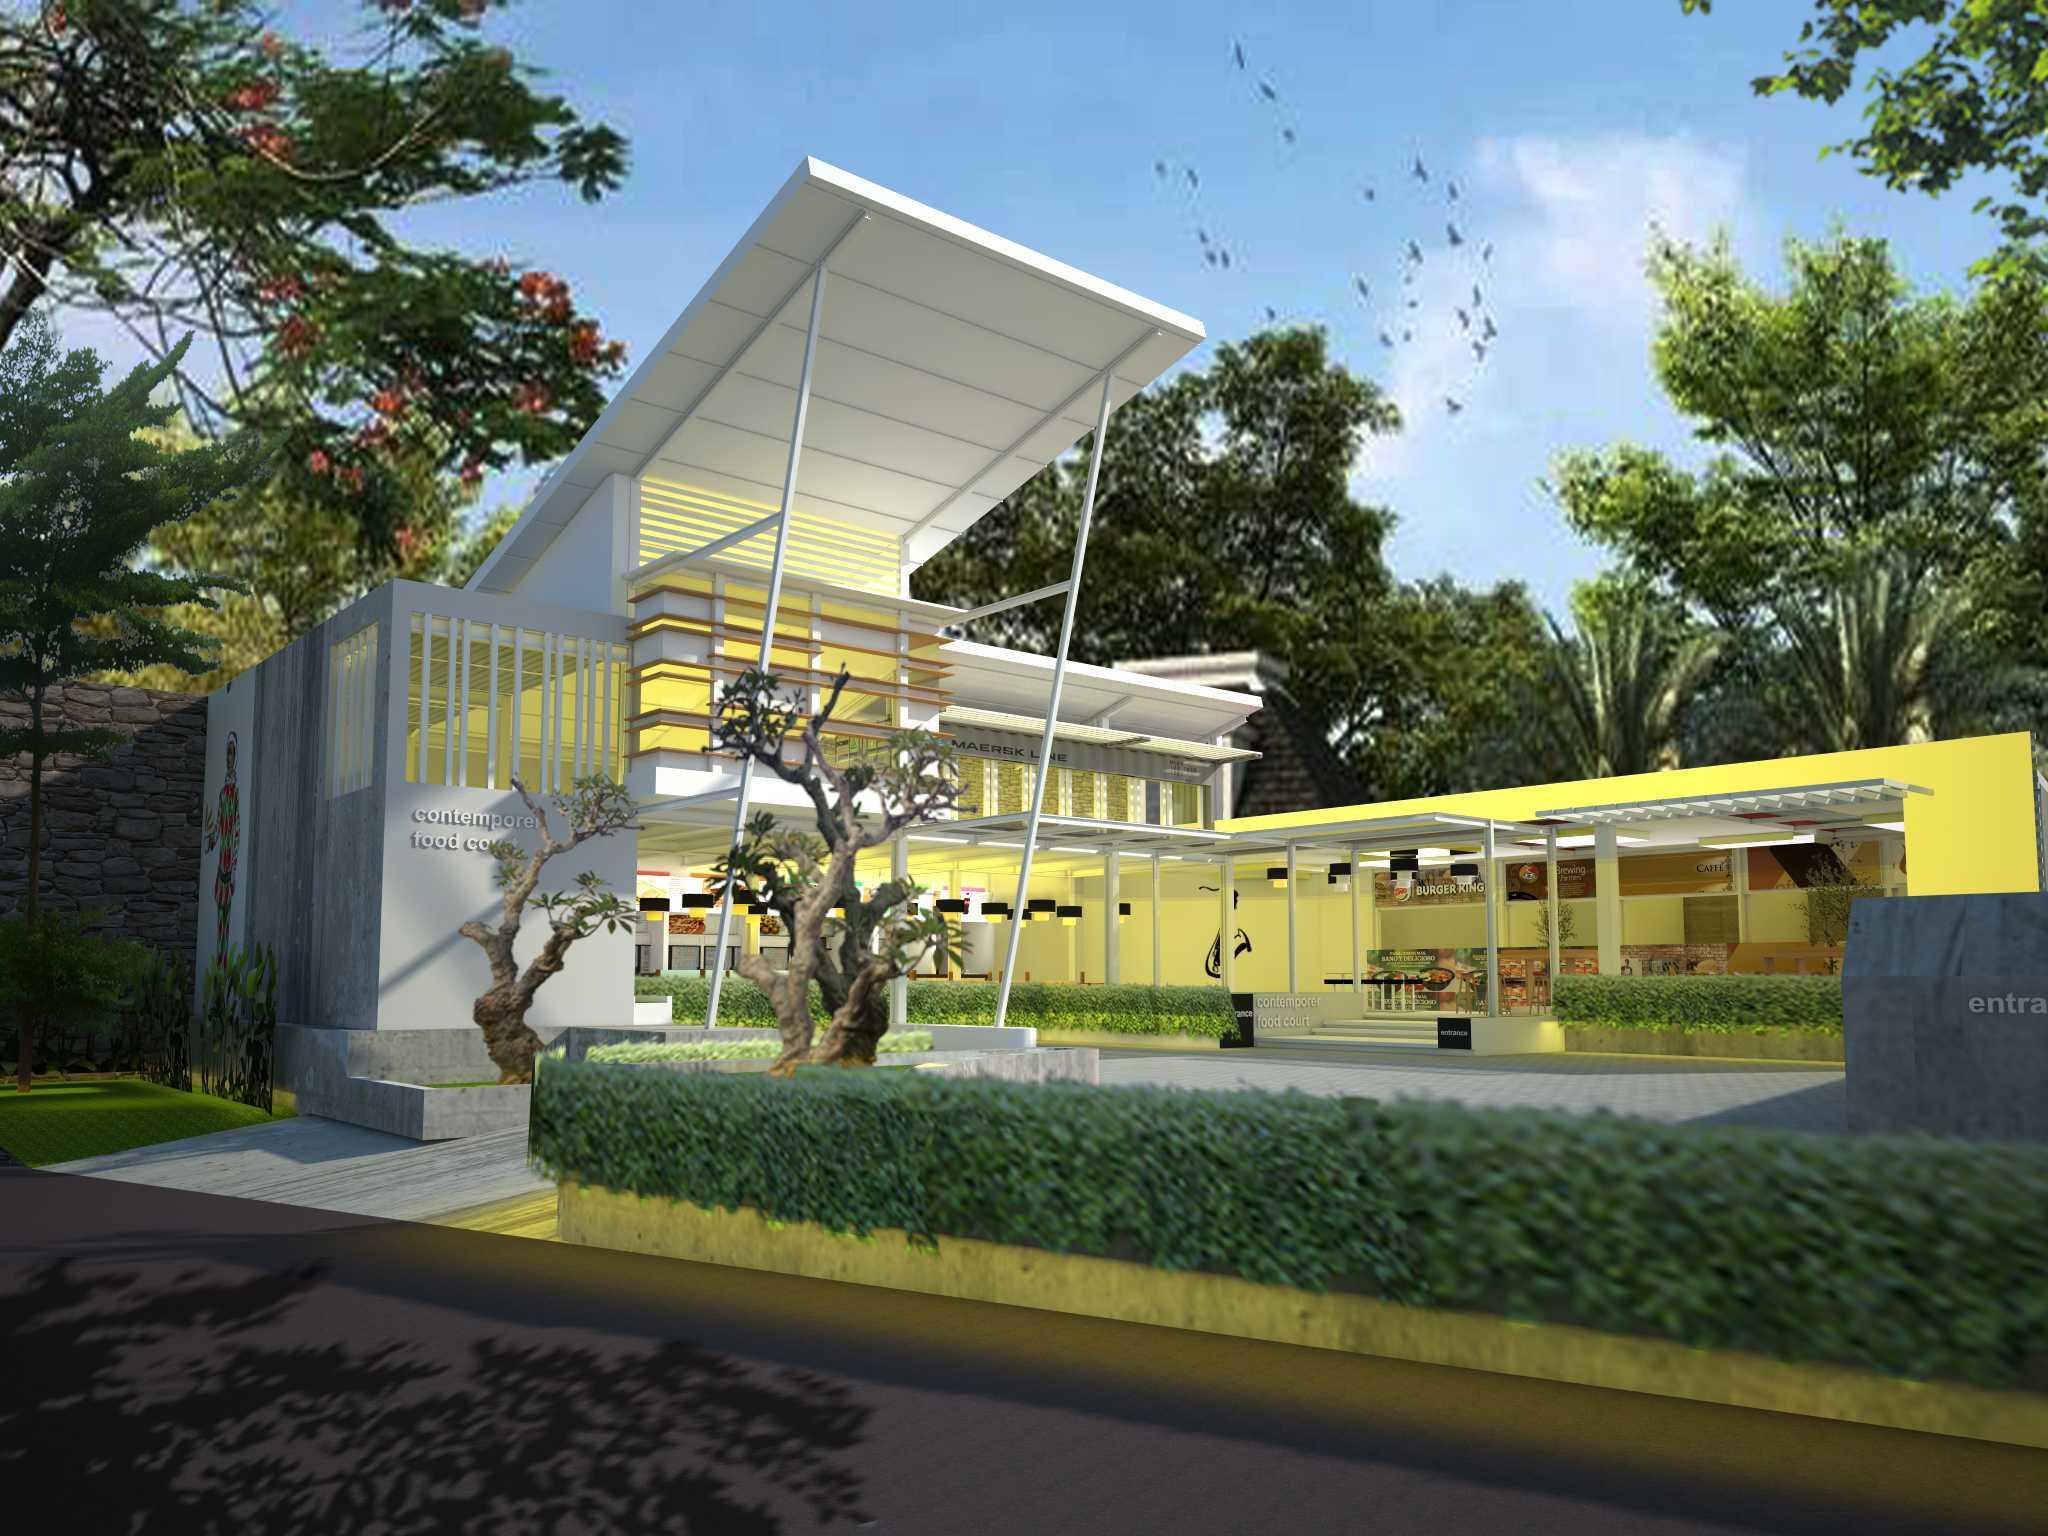 Aditya Wijaya / Studio Indirakasa Contemporer Food Court Temanggung Temanggung,jawa Tengah Temanggung,jawa Tengah Jadi-Tampak-Samping Kontemporer  19059